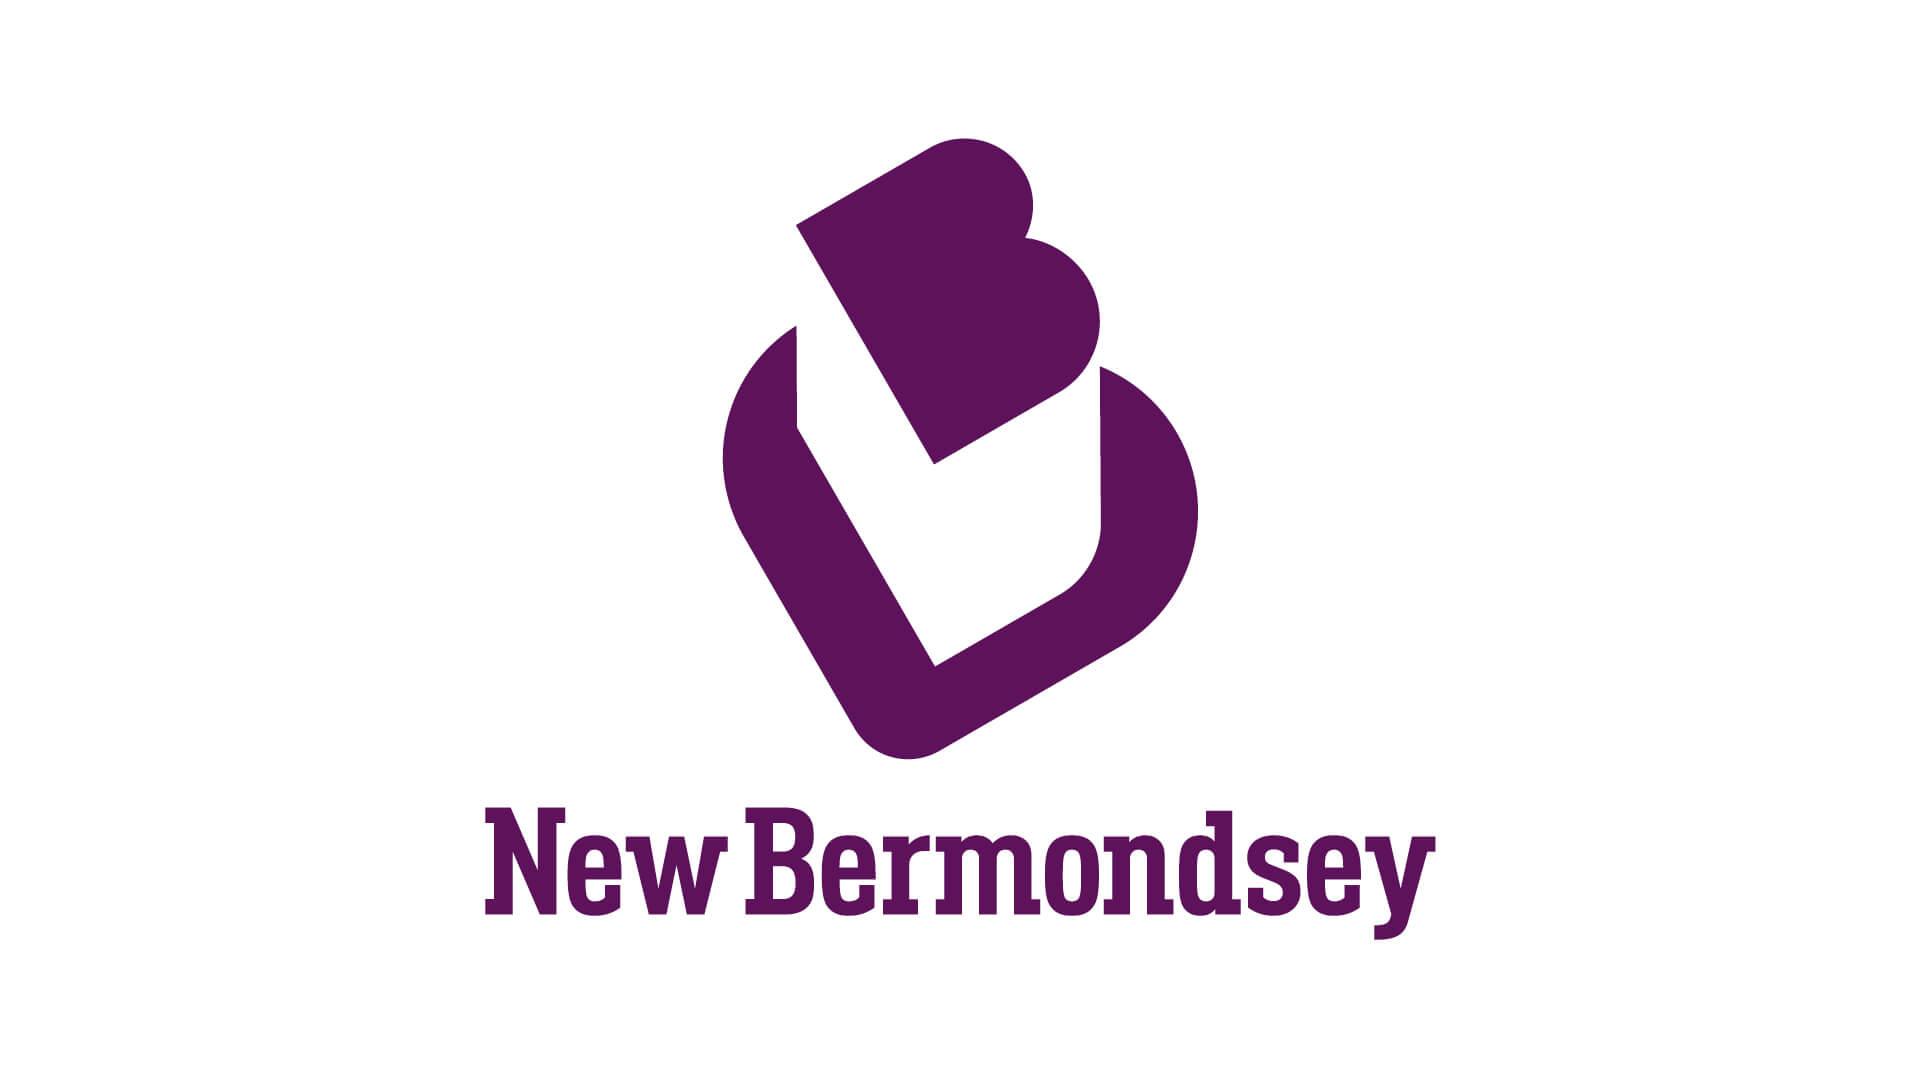 new bermondsey core brand identity